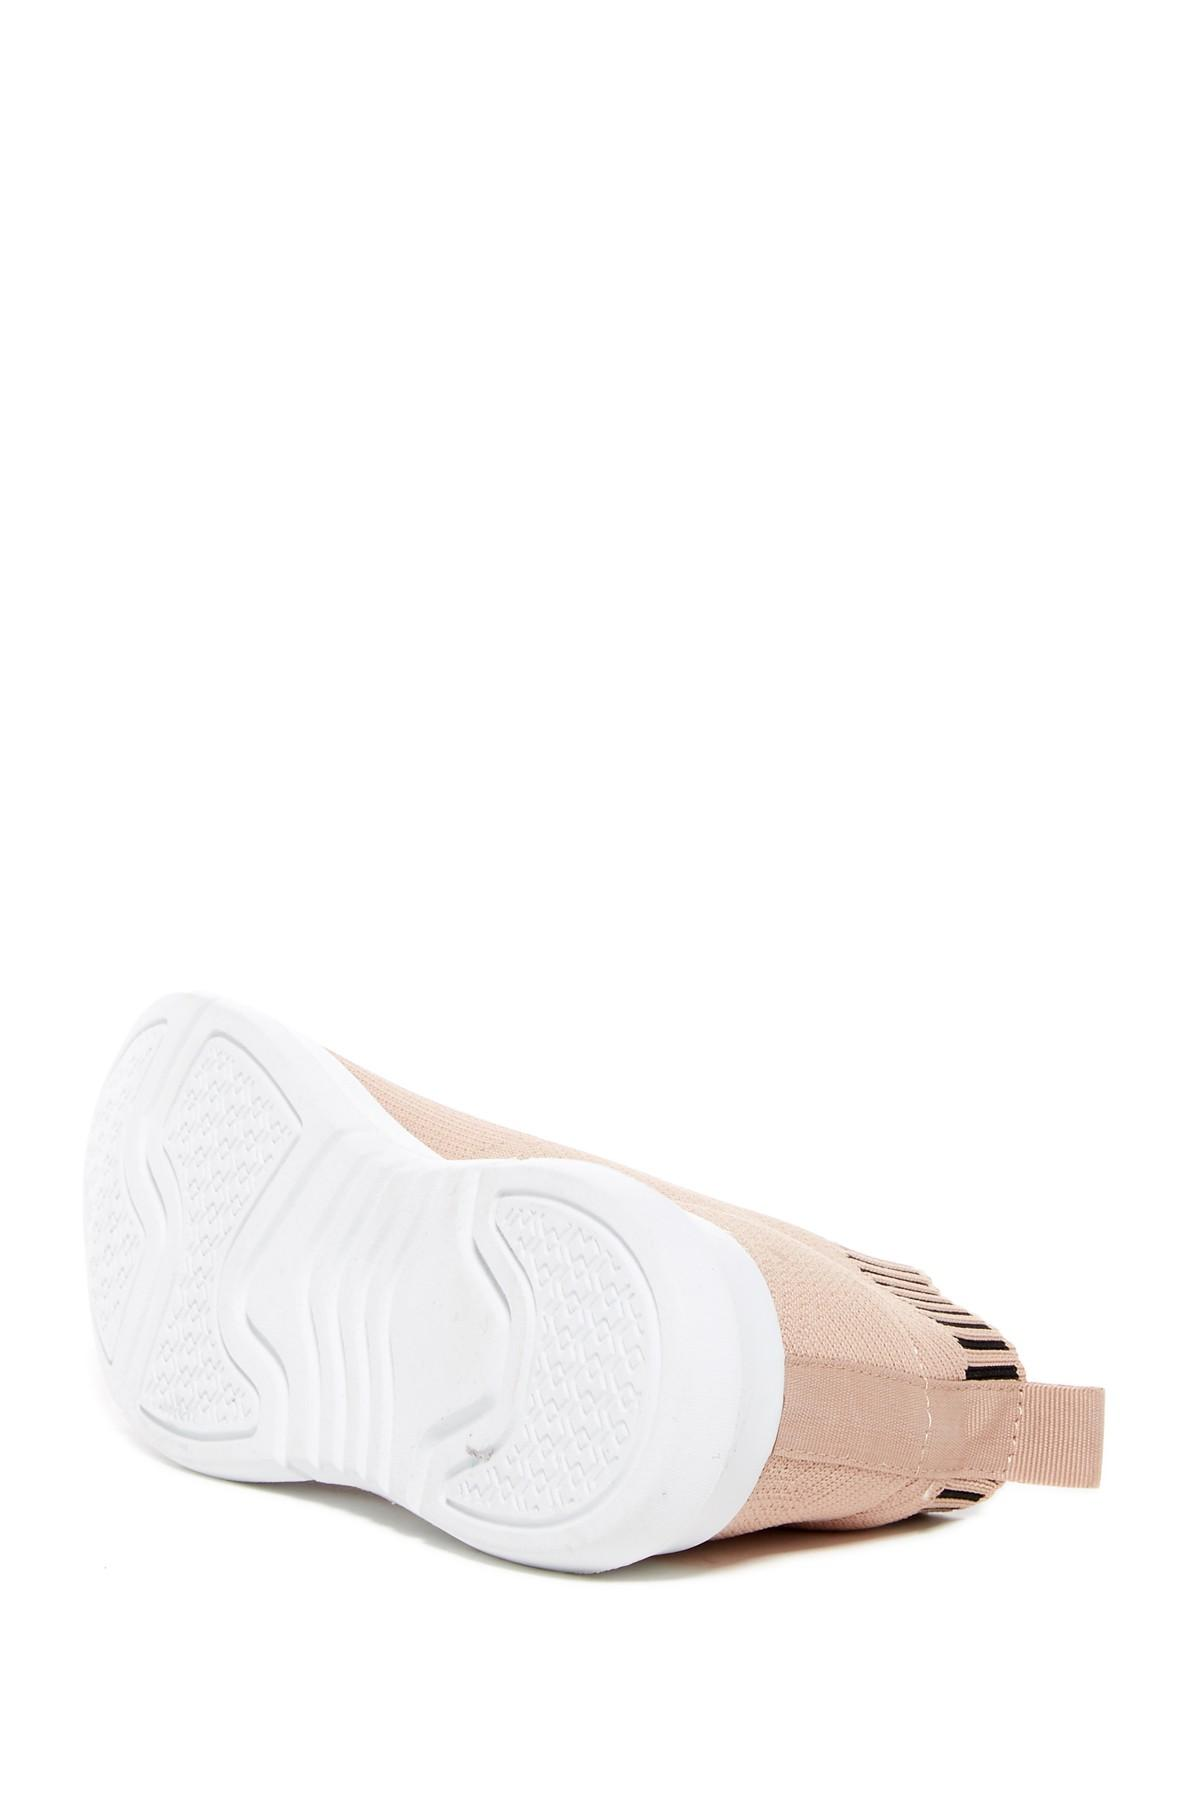 Farson Stretch Knit Sneaker